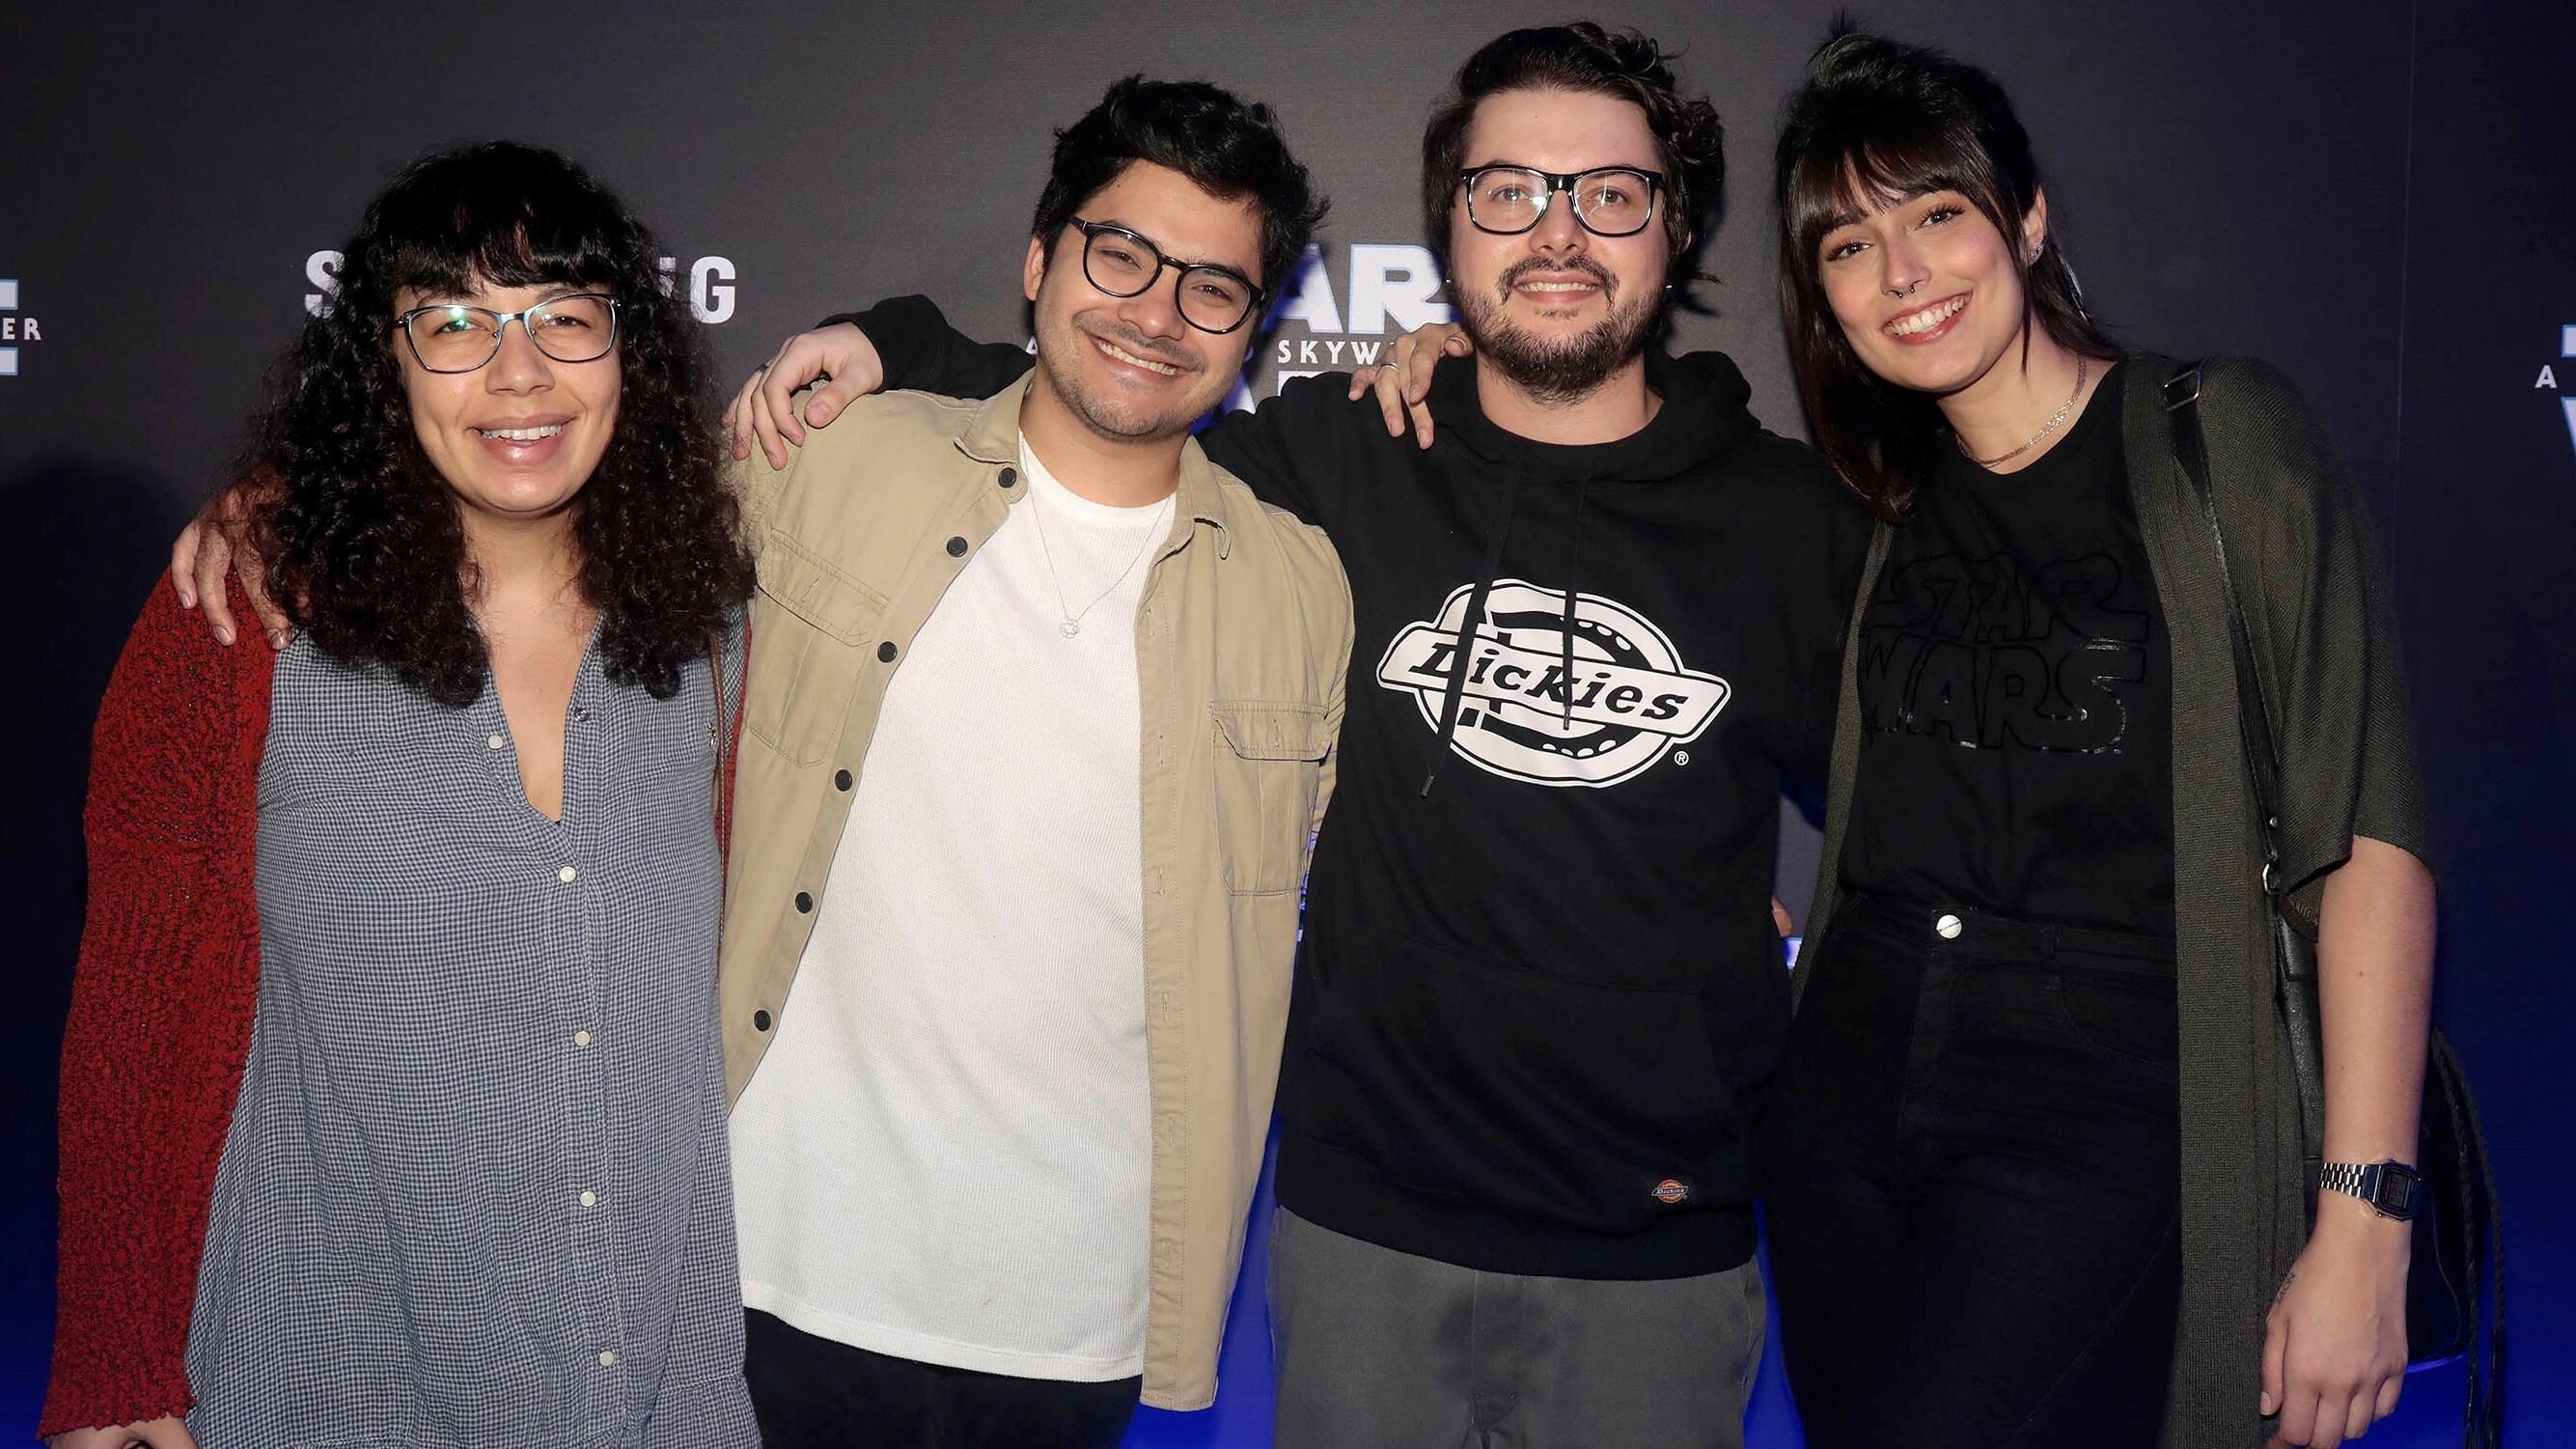 Pati Lima, Koba, Pedro Lanza e Anie